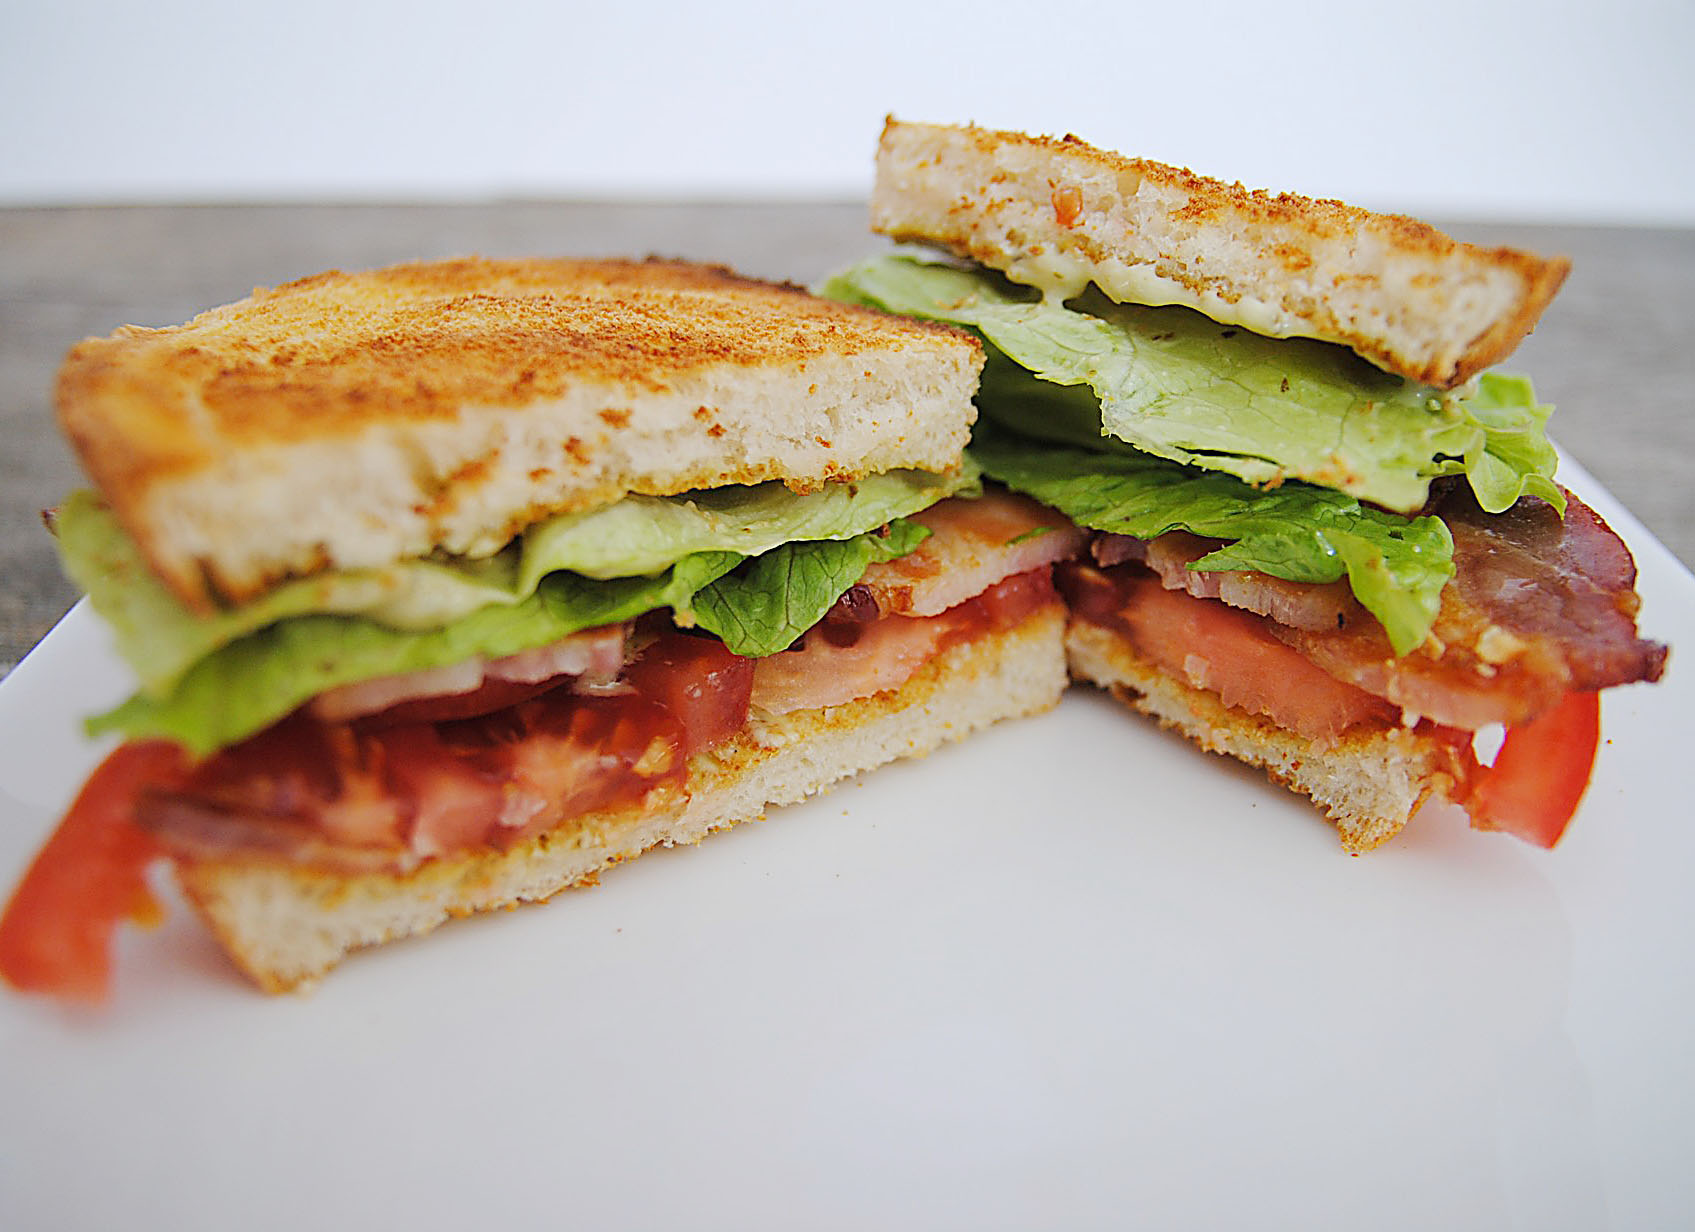 BLT with pesto mayo | Soph n' Stuff